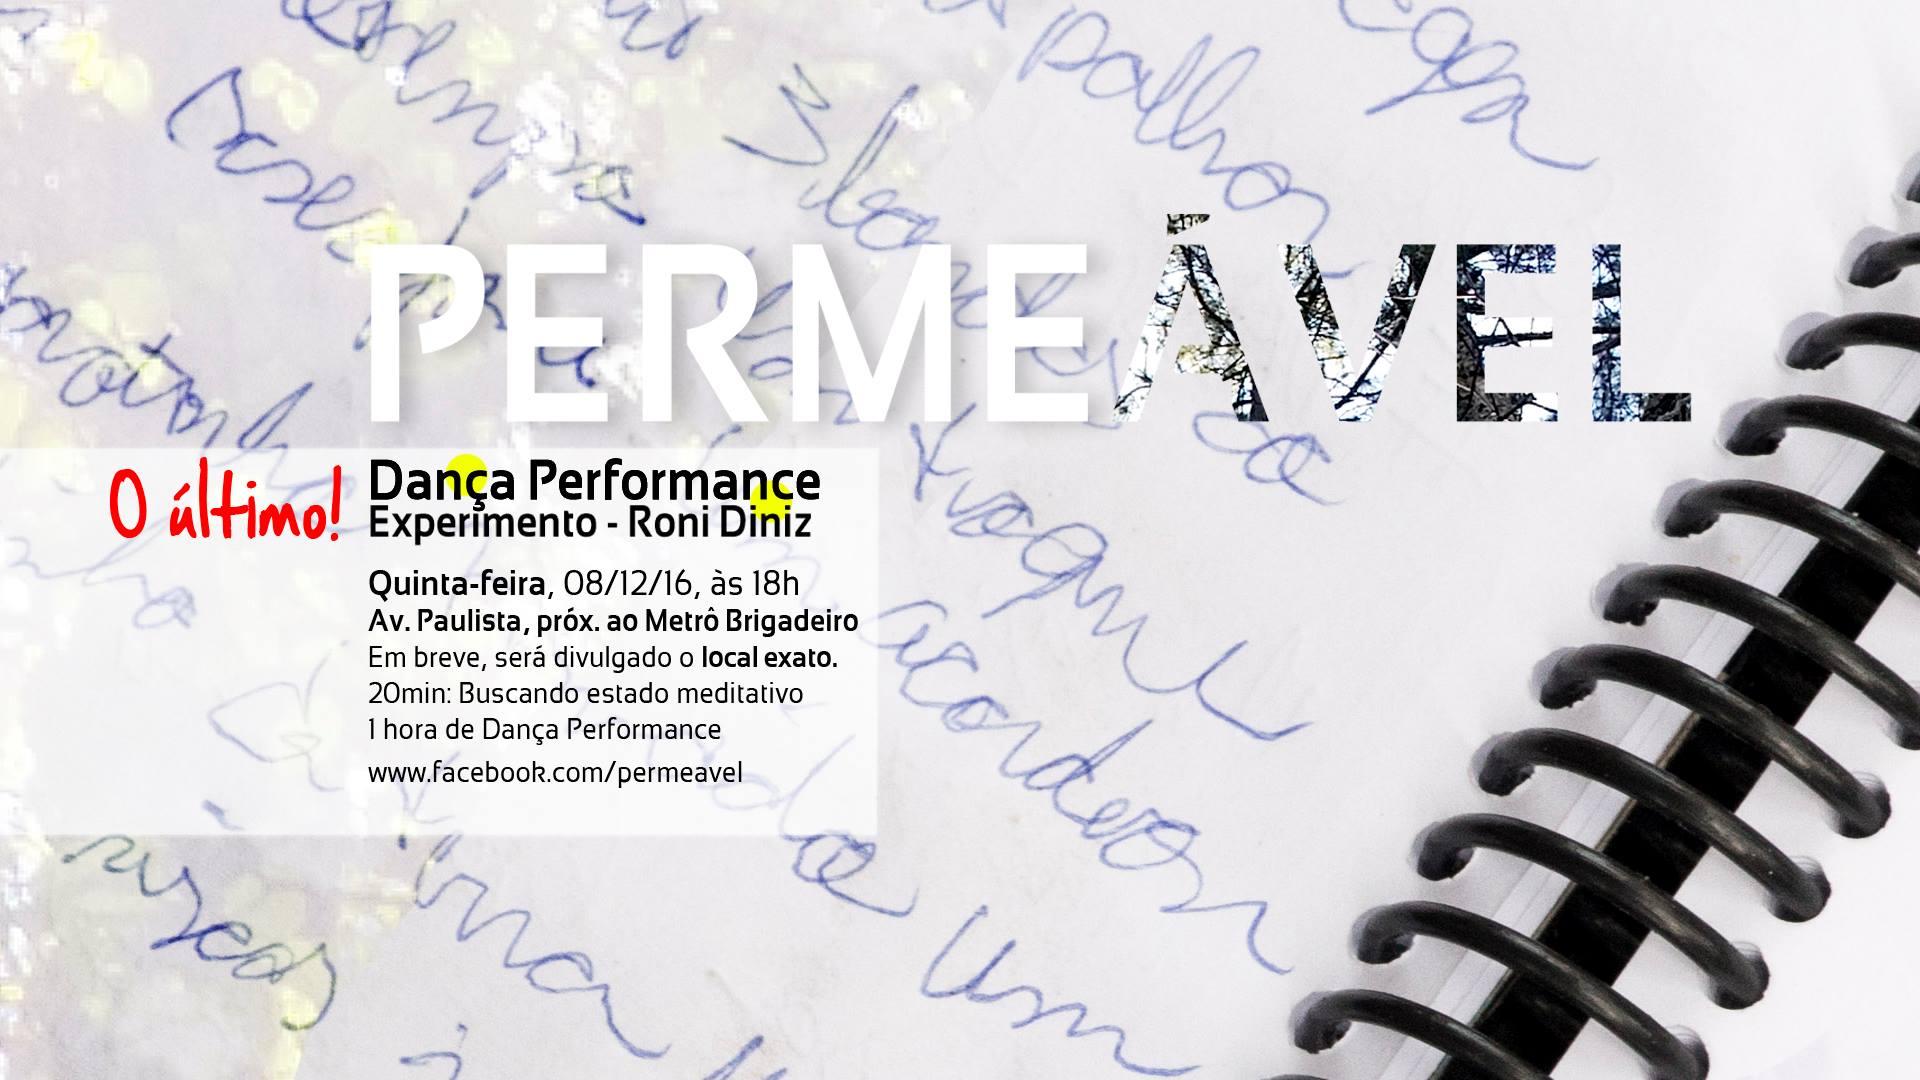 Permeável_Dança_Performance_-_Flyer_6º_Experimento